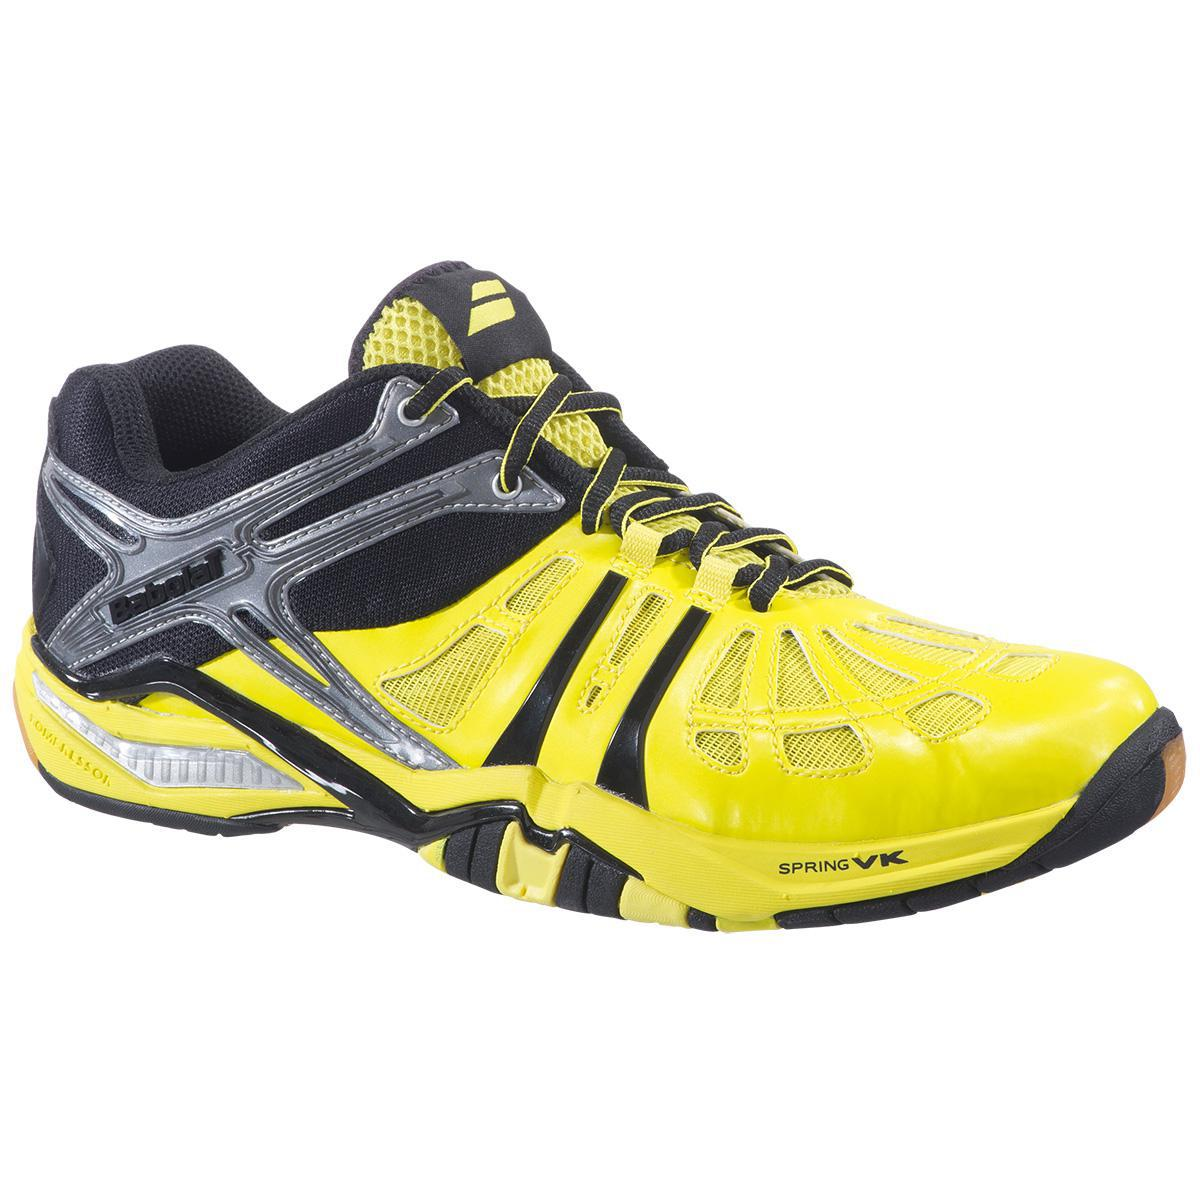 Mens High End Tennis Shoes